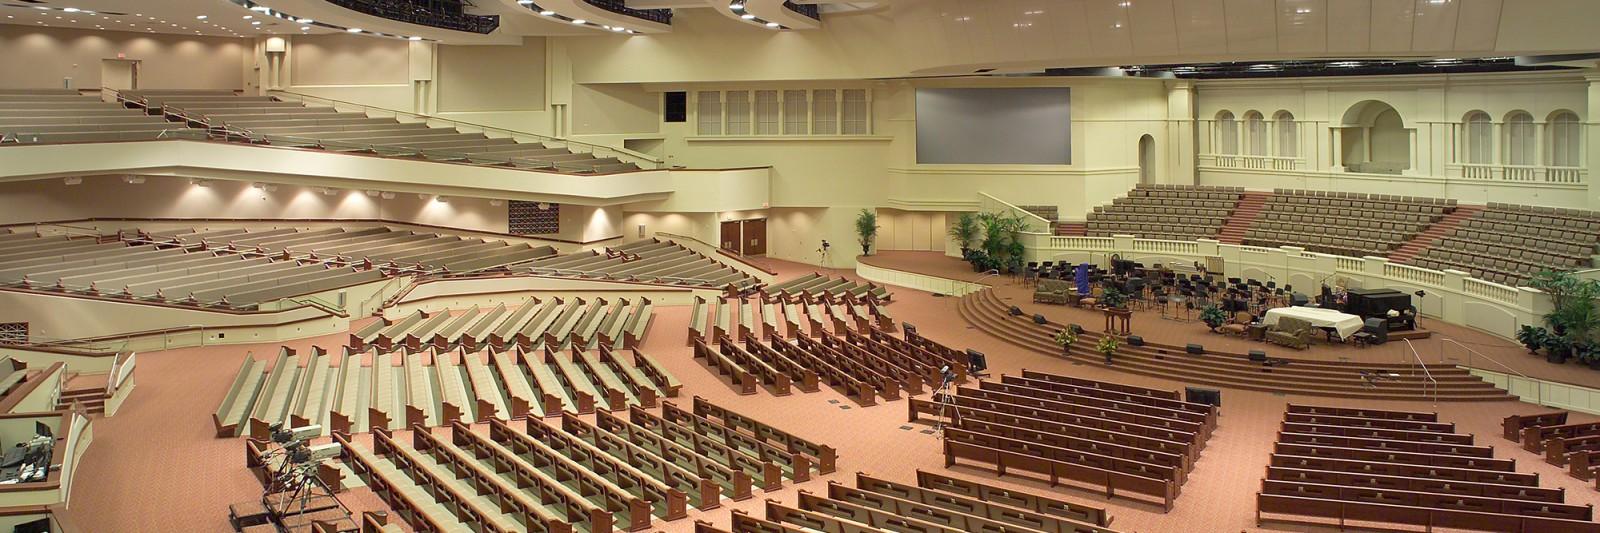 Idlewild Baptist Church The Beck Group